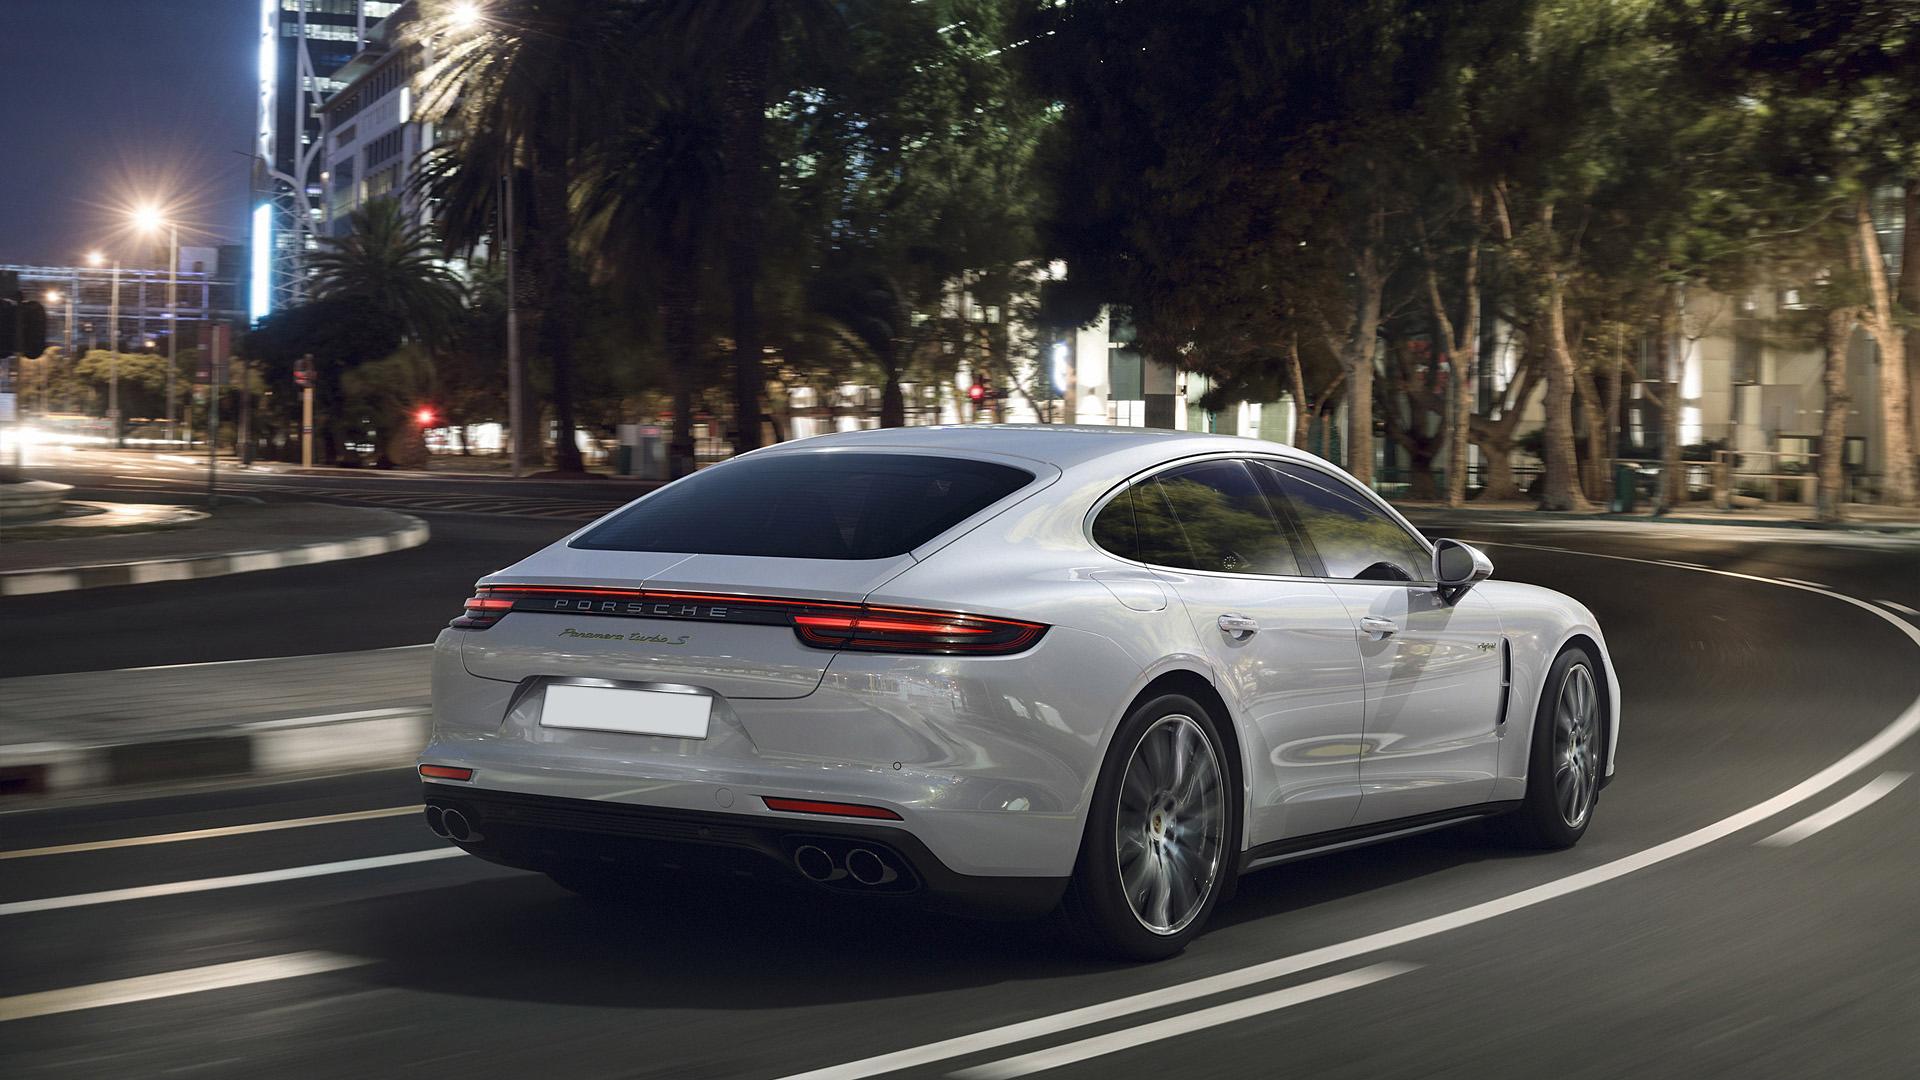 2018-Porsche-Panamera-Turbo-S-E-Hybrid-1080p.jpg